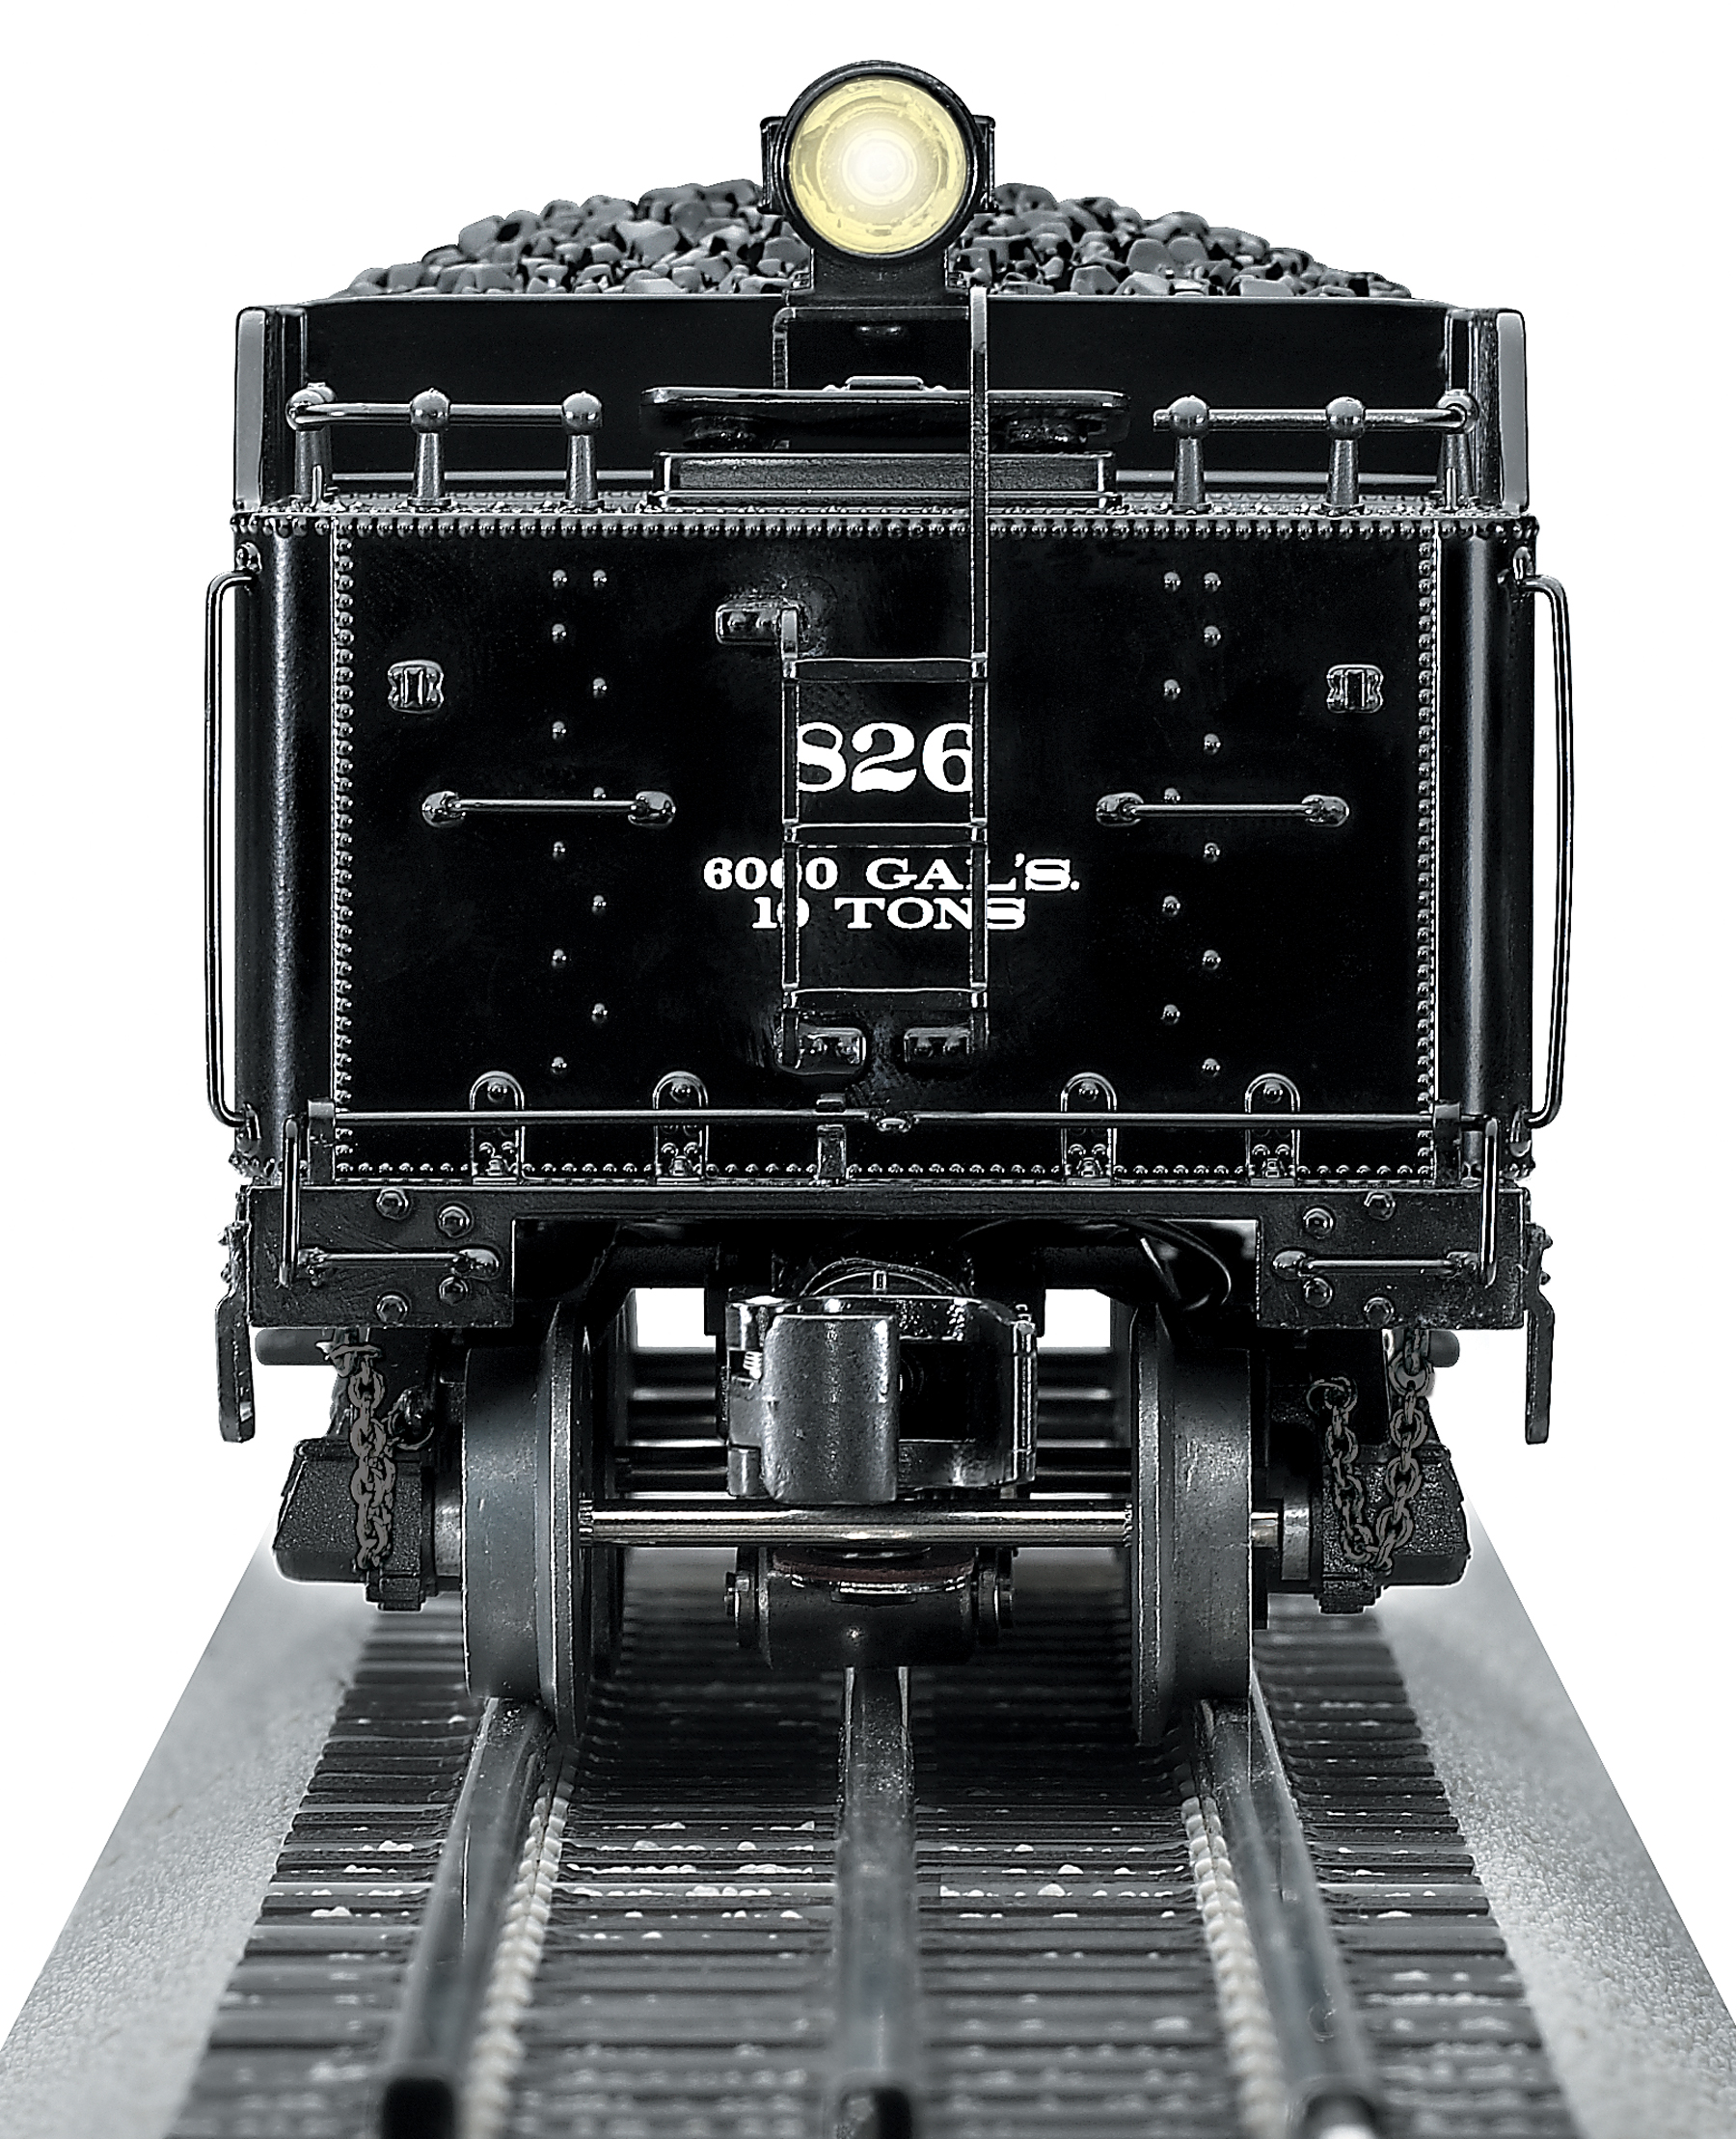 wabash tmcc scale 2 6 0 mogul steam locomotive 826 Lionel Train Parts Diagram 2 6 0 mogul parts list 2003 2 6 0 mogul pictorial diagram 2003 2 6 0 mogul wiring diagram 2003 2 6 0 mogul steam loco \u0026 tender 7 04